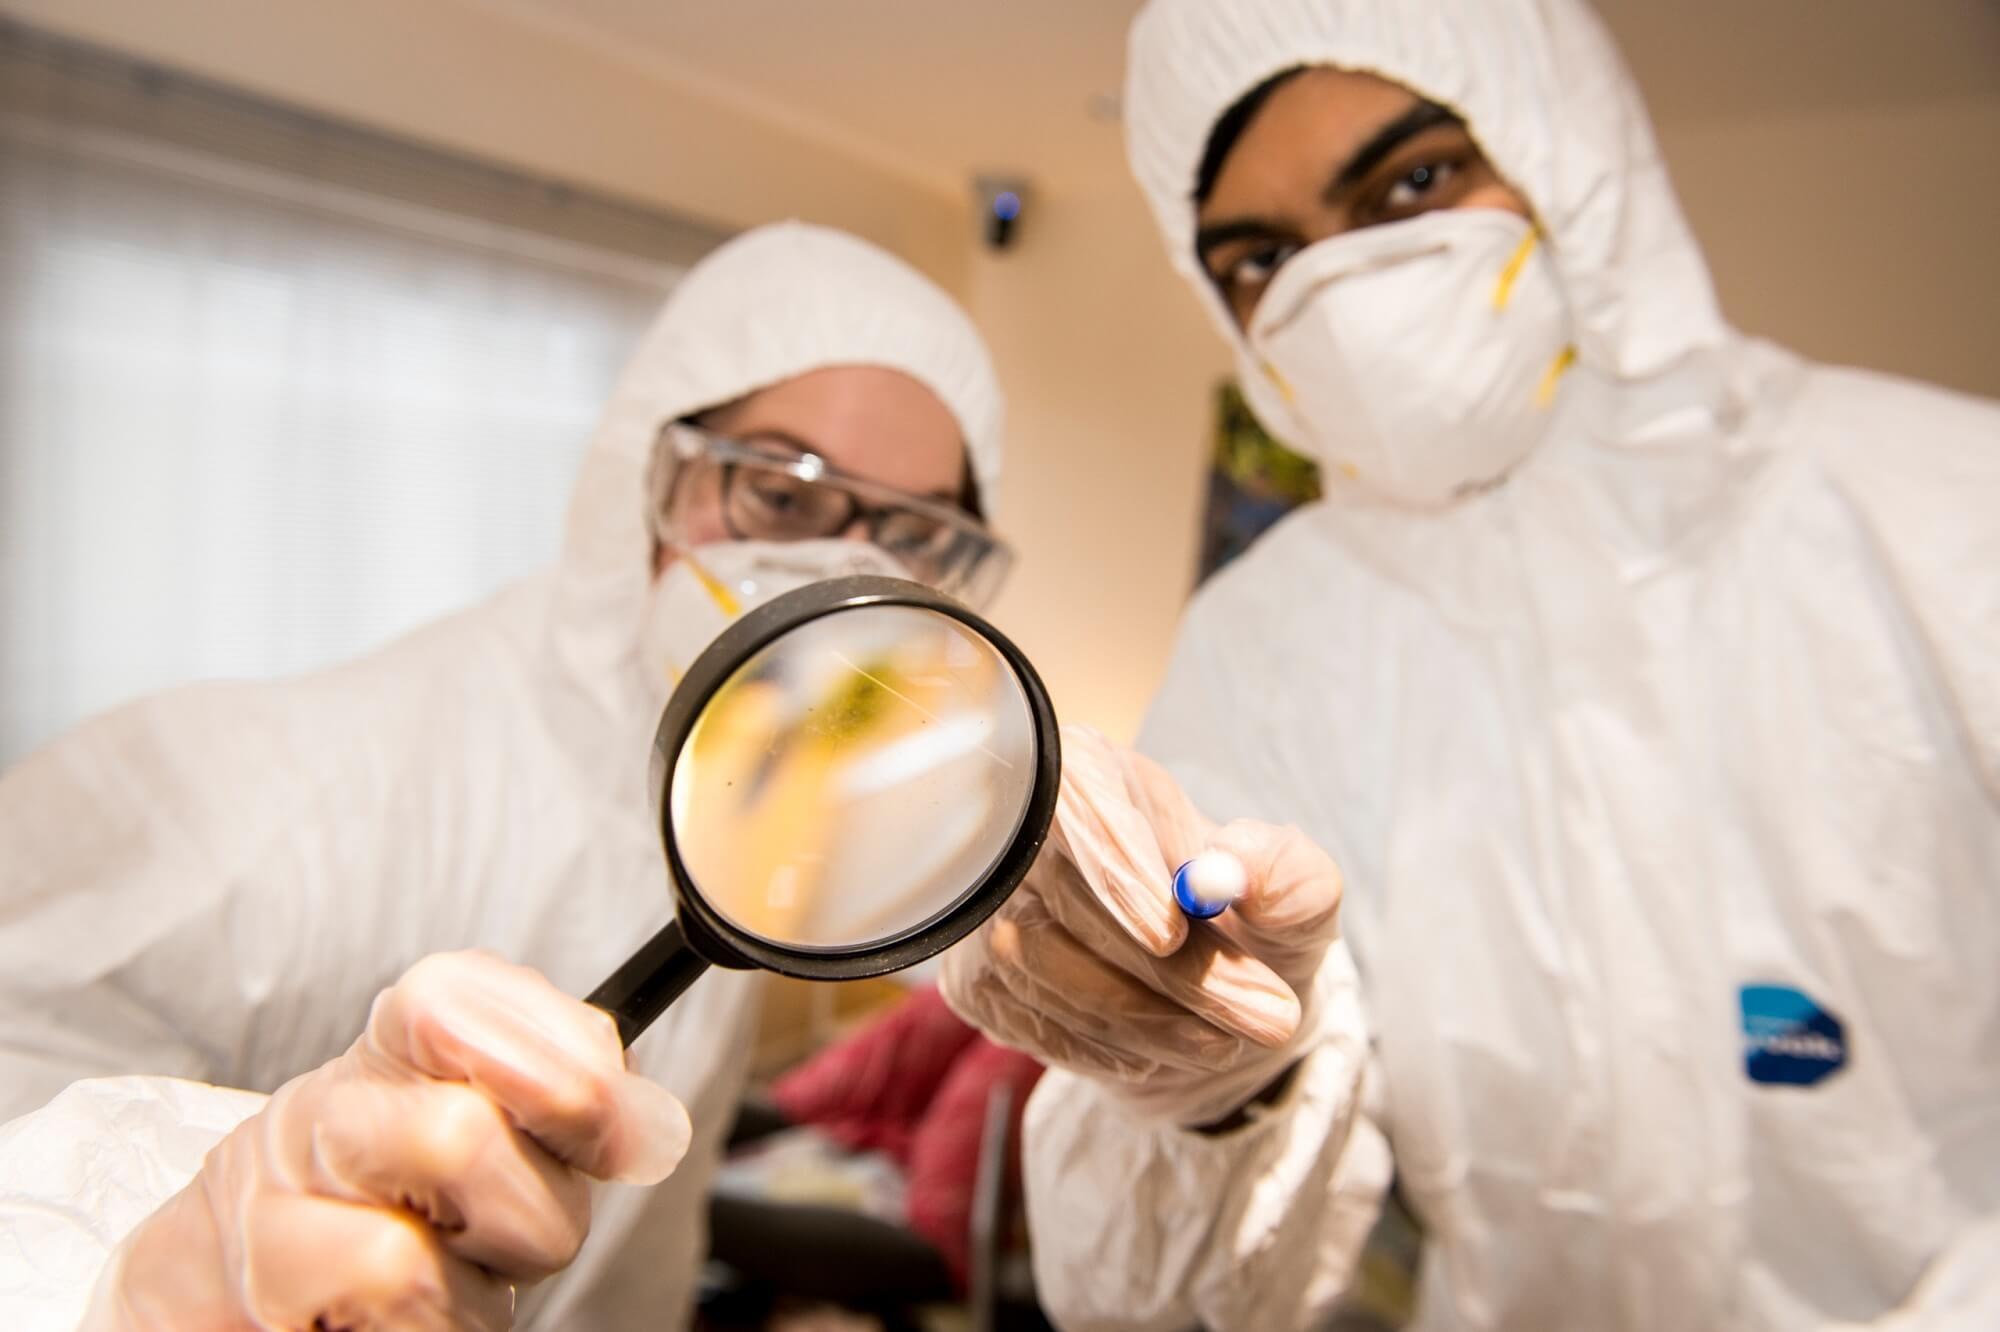 Foresnsics students examining a specimen